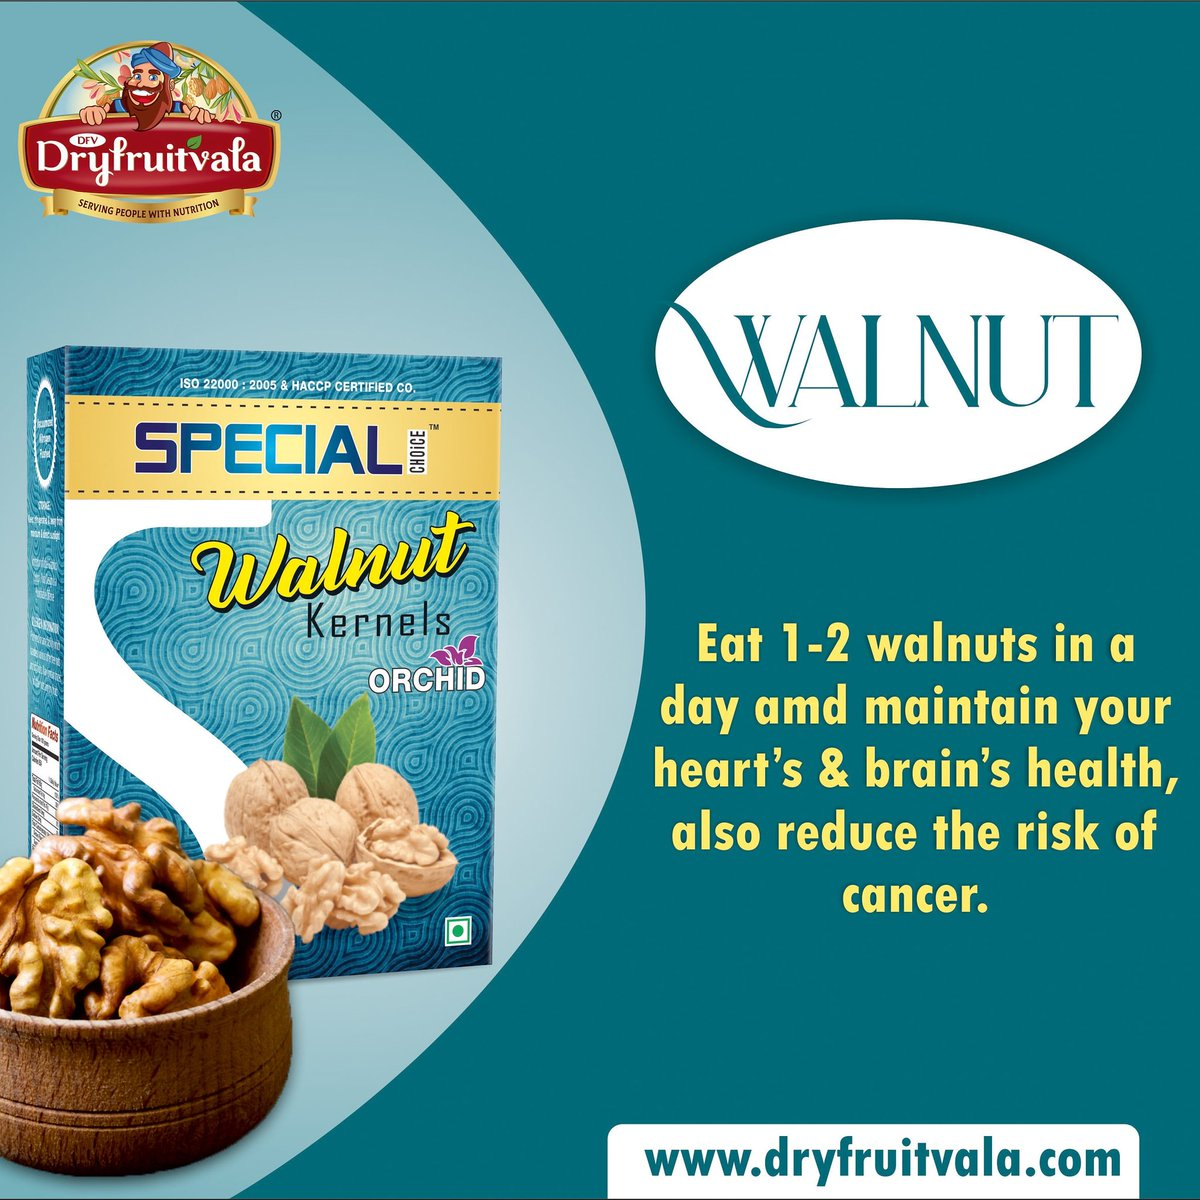 Have some walnuts today. Visit~ . . . . . #dryfruit #almond #cashews #chura #dates #khajoor #pistachio #pista #walnuts #Anjeer #dryfruits #dryfruitsandnuts #almonds #cashew #diwali #sale #gifts #dryfruits #love #picoftheday  #pic